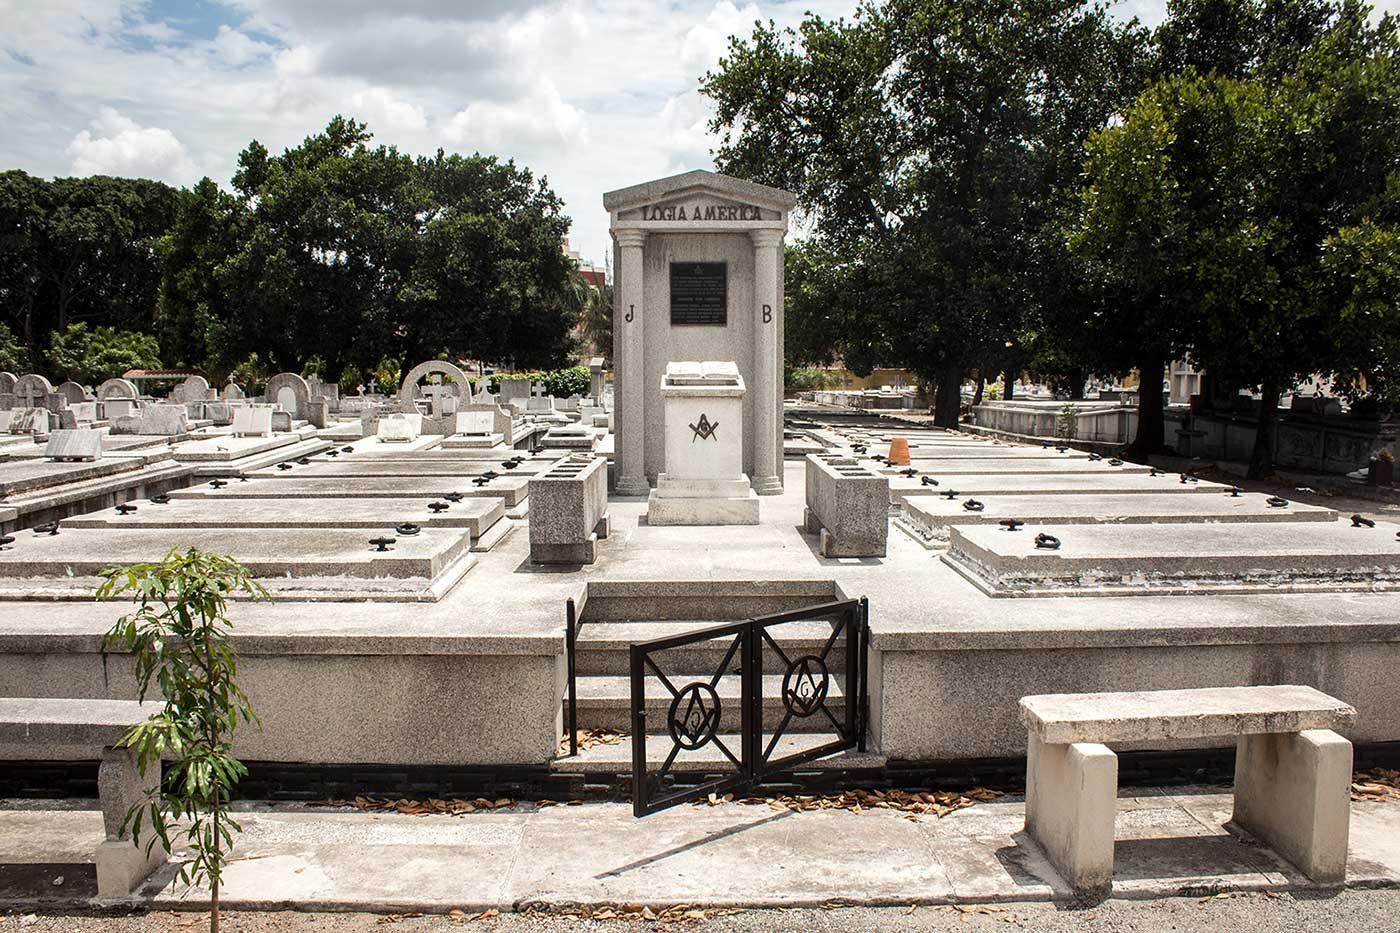 Memorial plot for 'Logia America': Necrópolis Cristóbal Colón, Havana, Cuba.